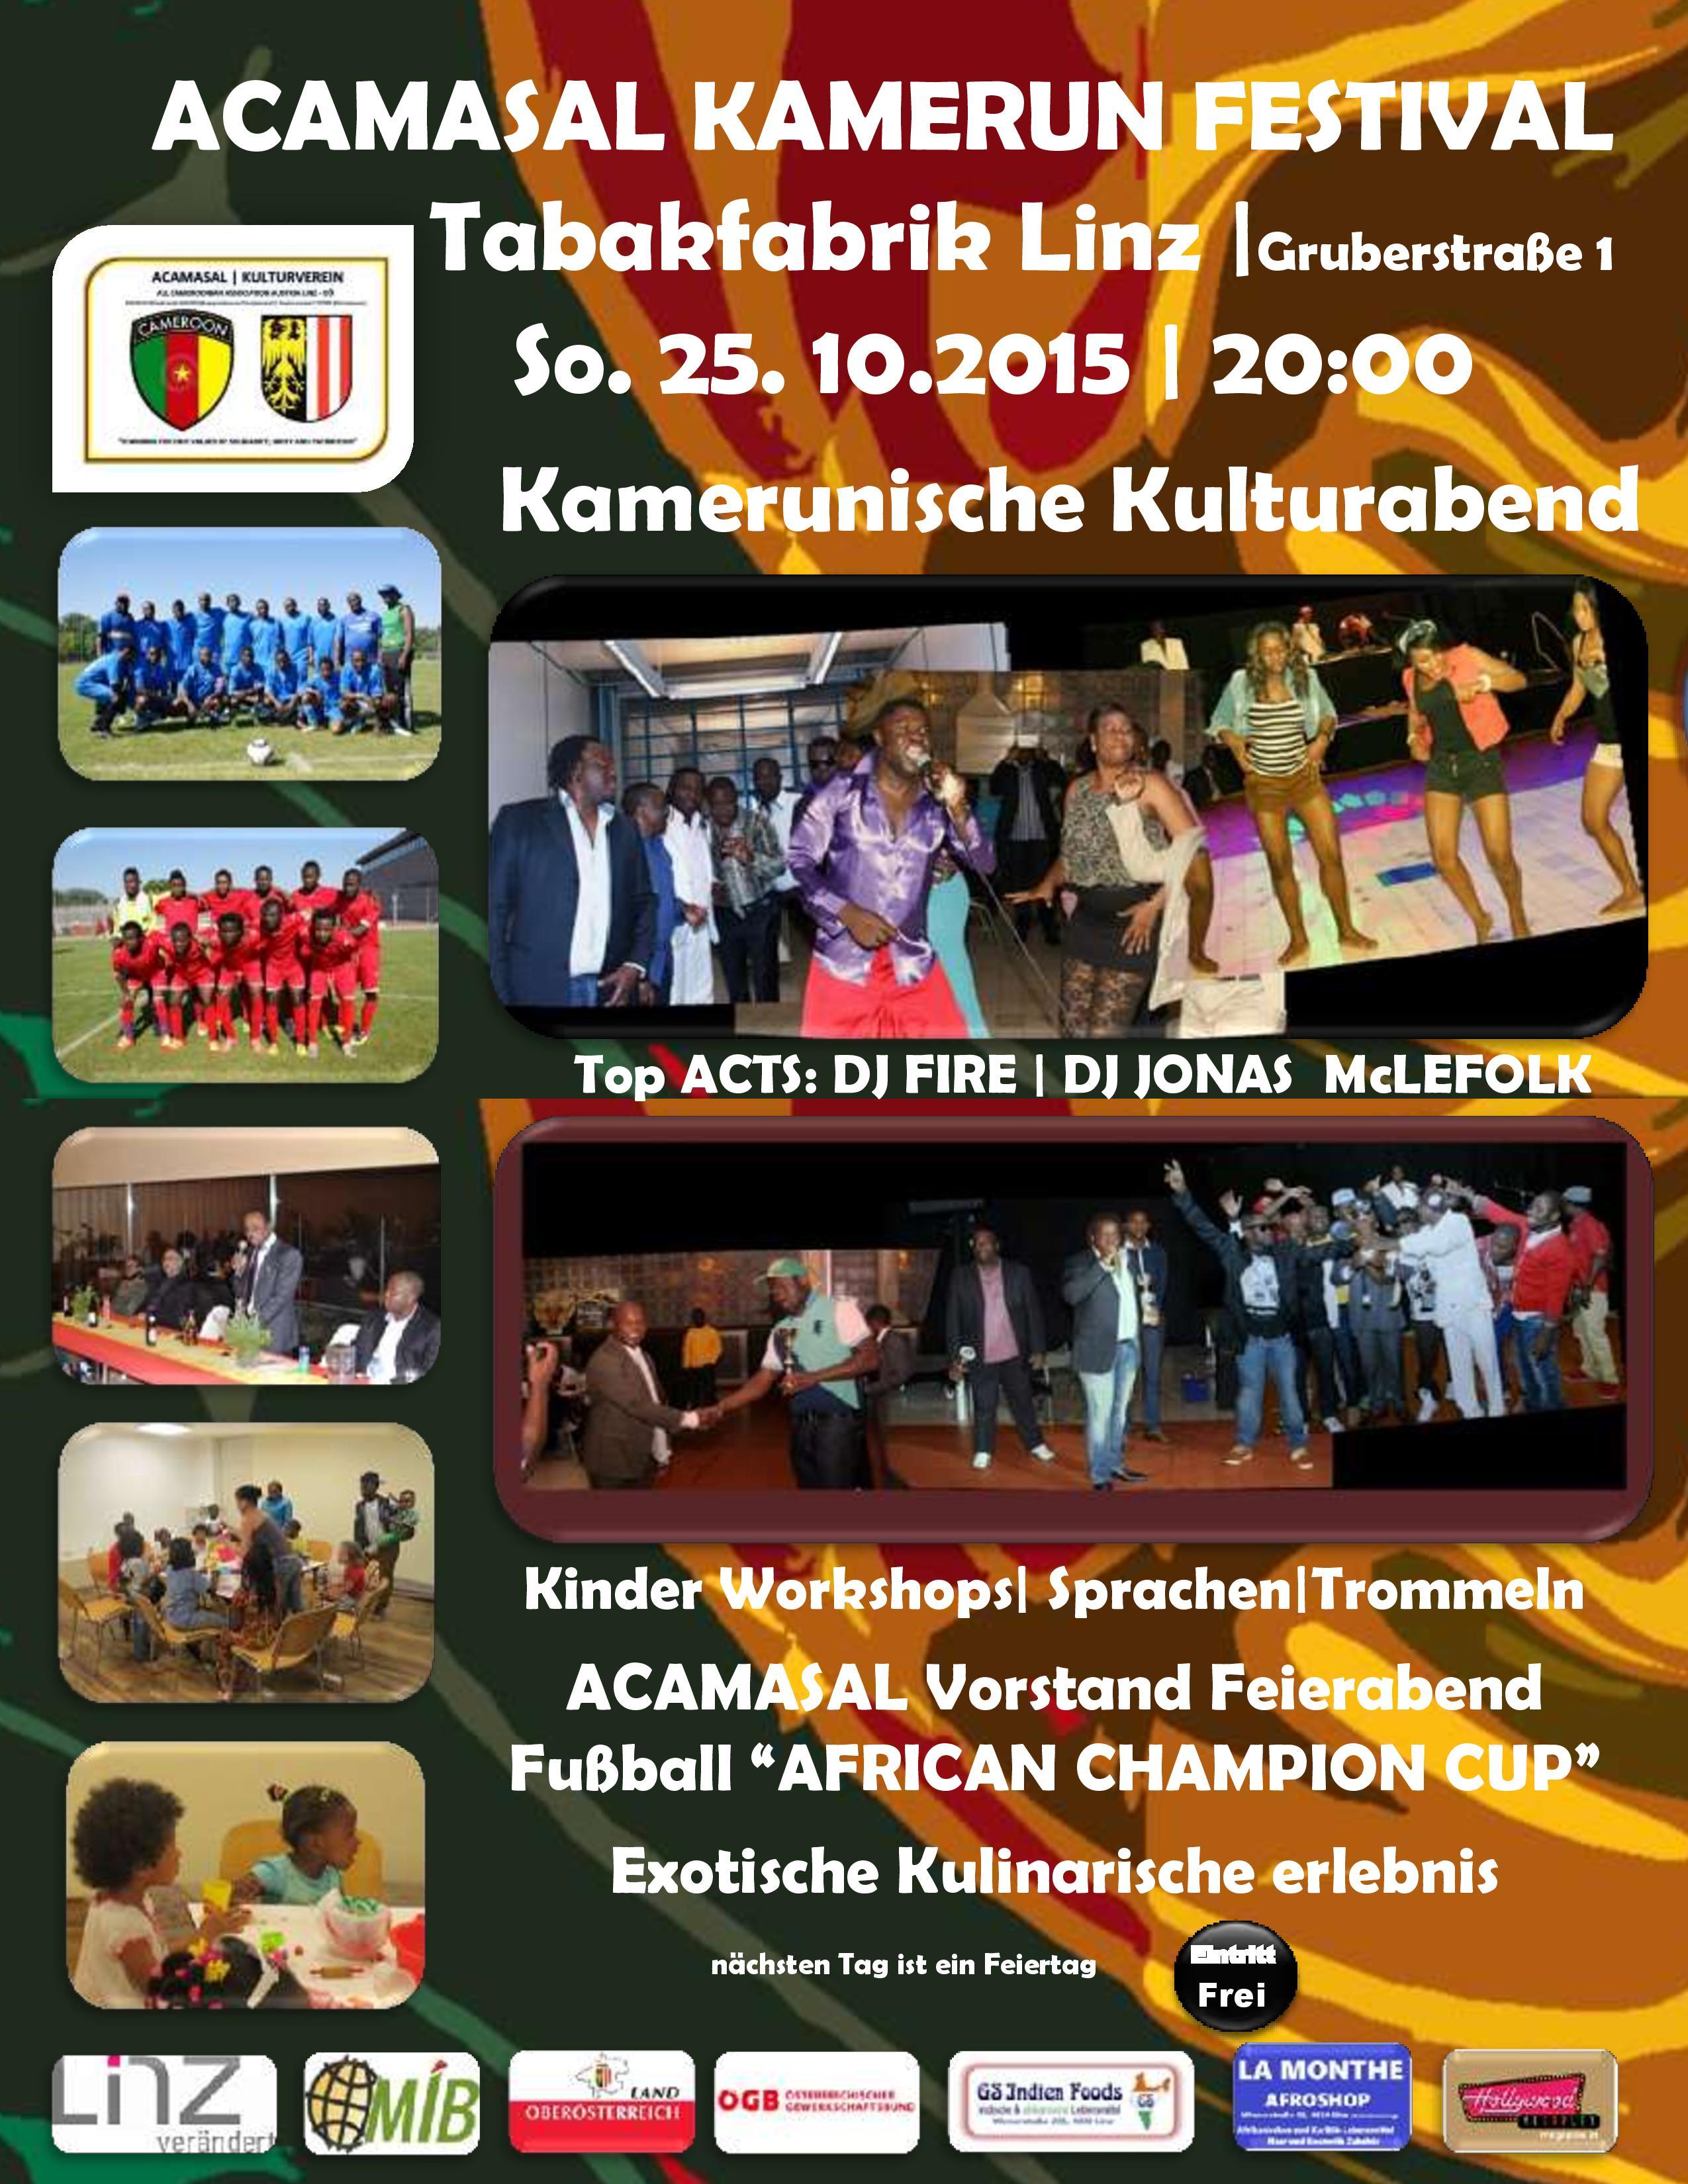 Acamasal Kamerun Festival 20151025